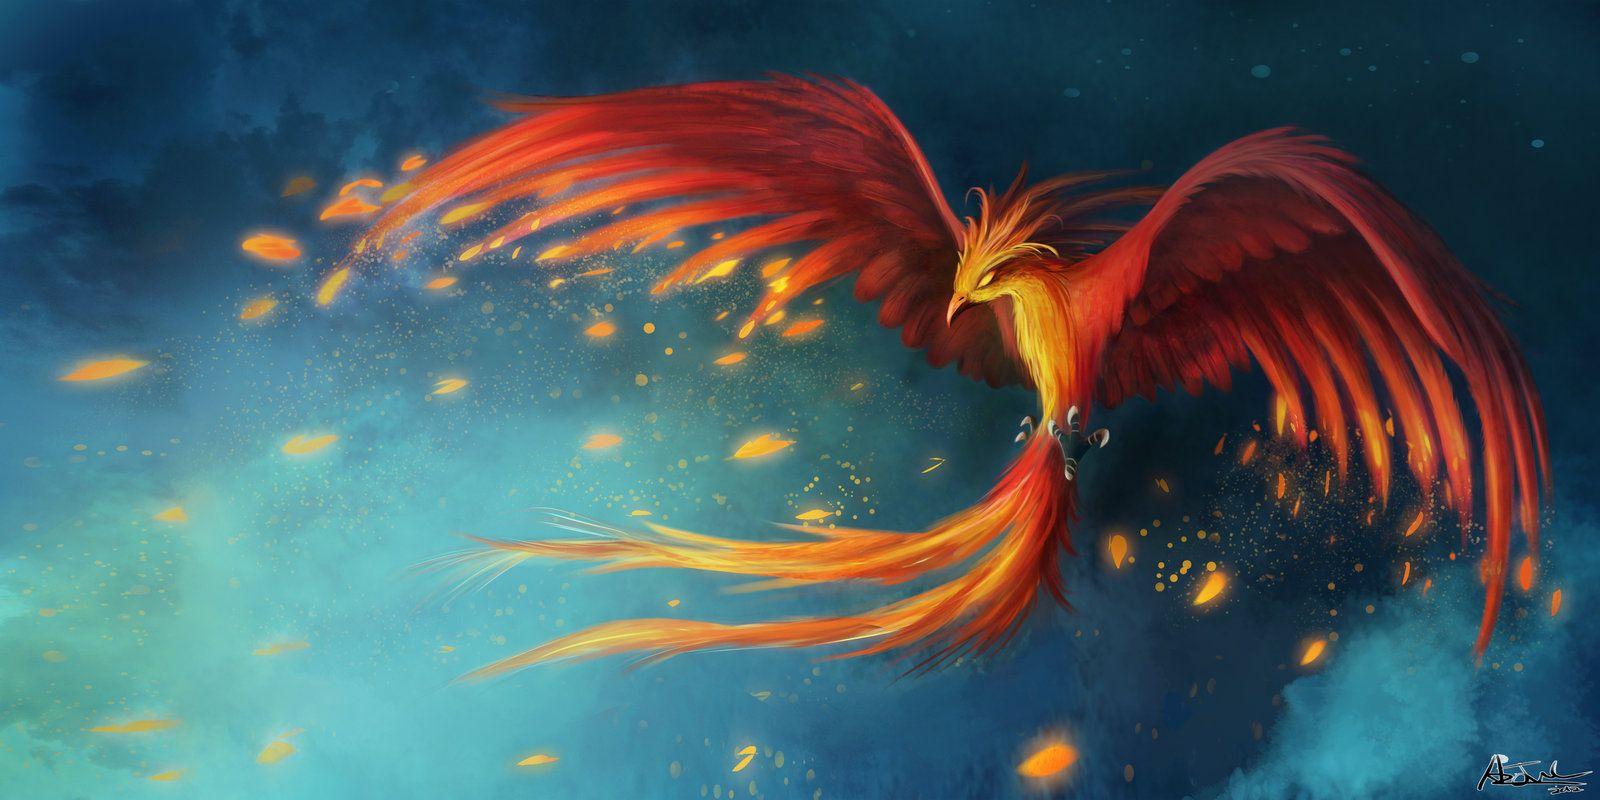 Tattoo ideas for men little philomena  equestriaus finest phoenix by udaeronjvl on deviantart